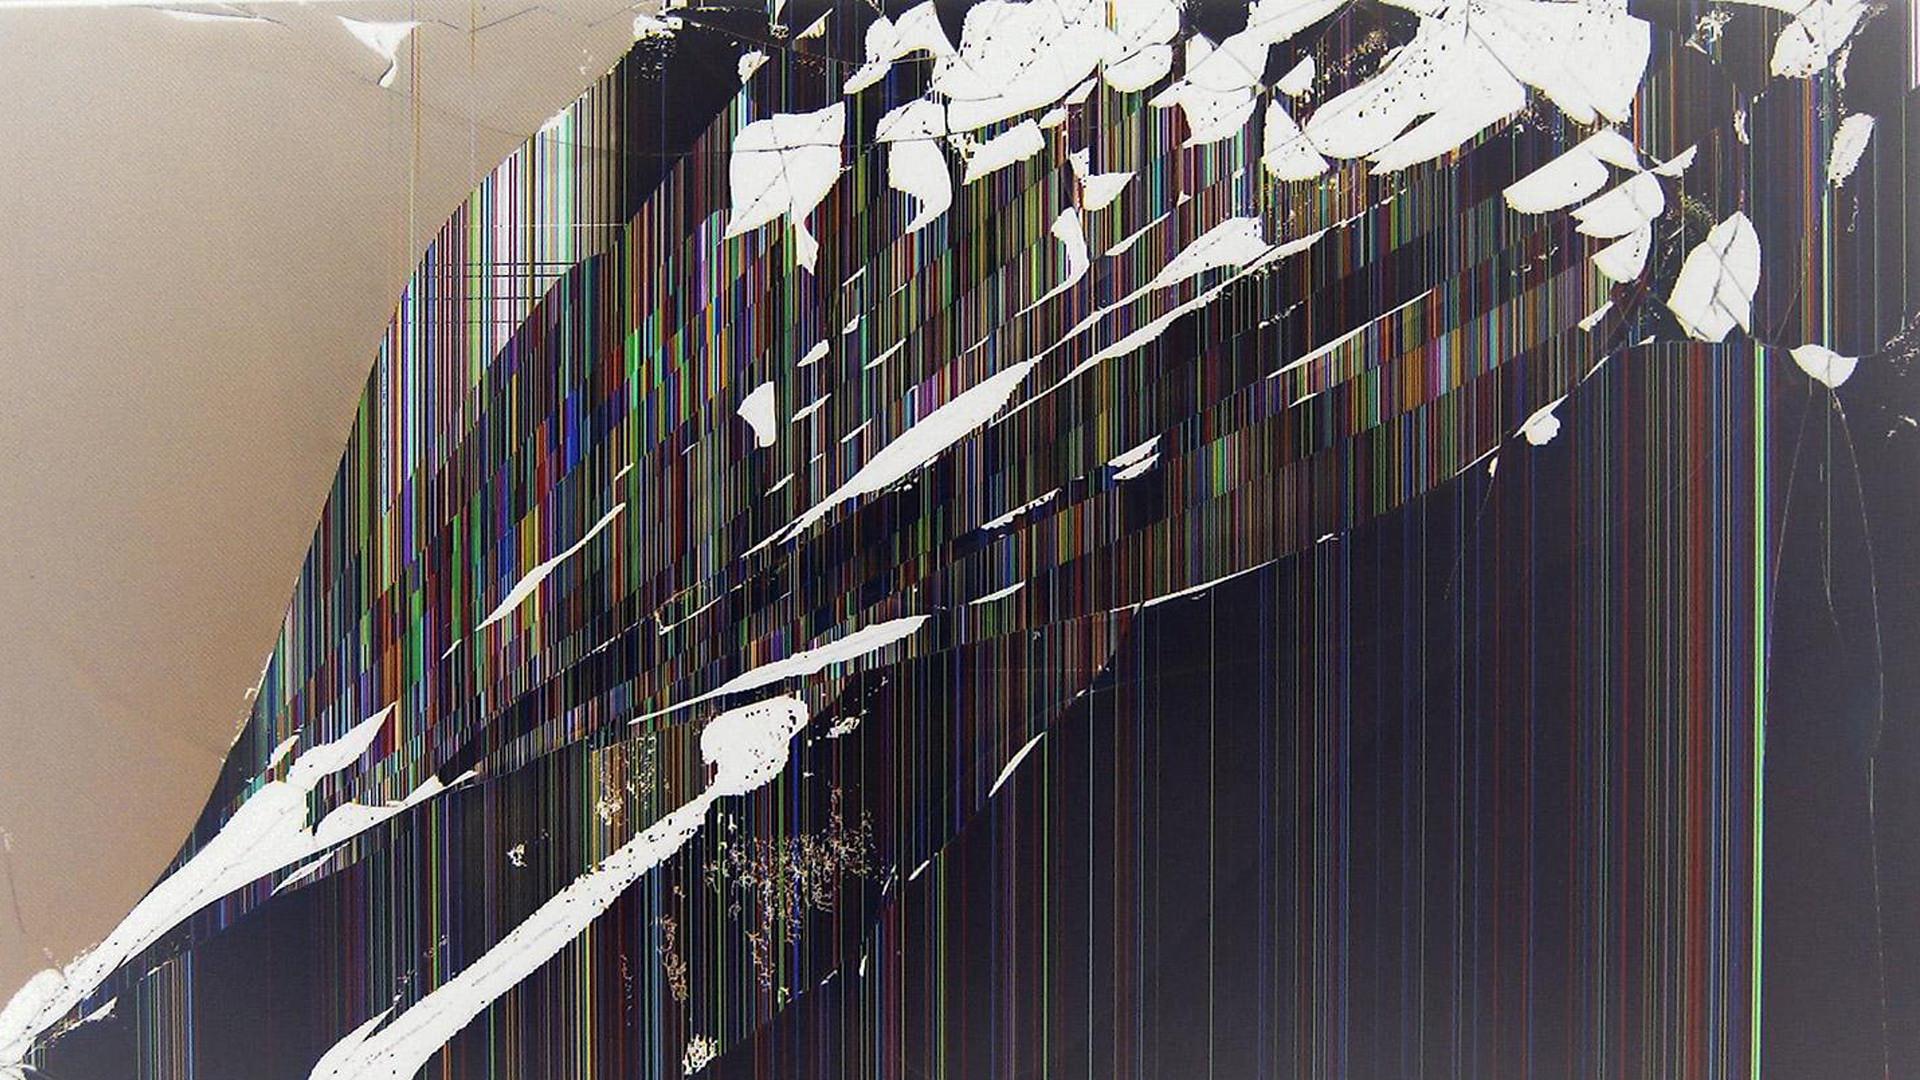 Cracked screen wallpaper prank wallpapersafari - How to do the broken tv screen prank ...